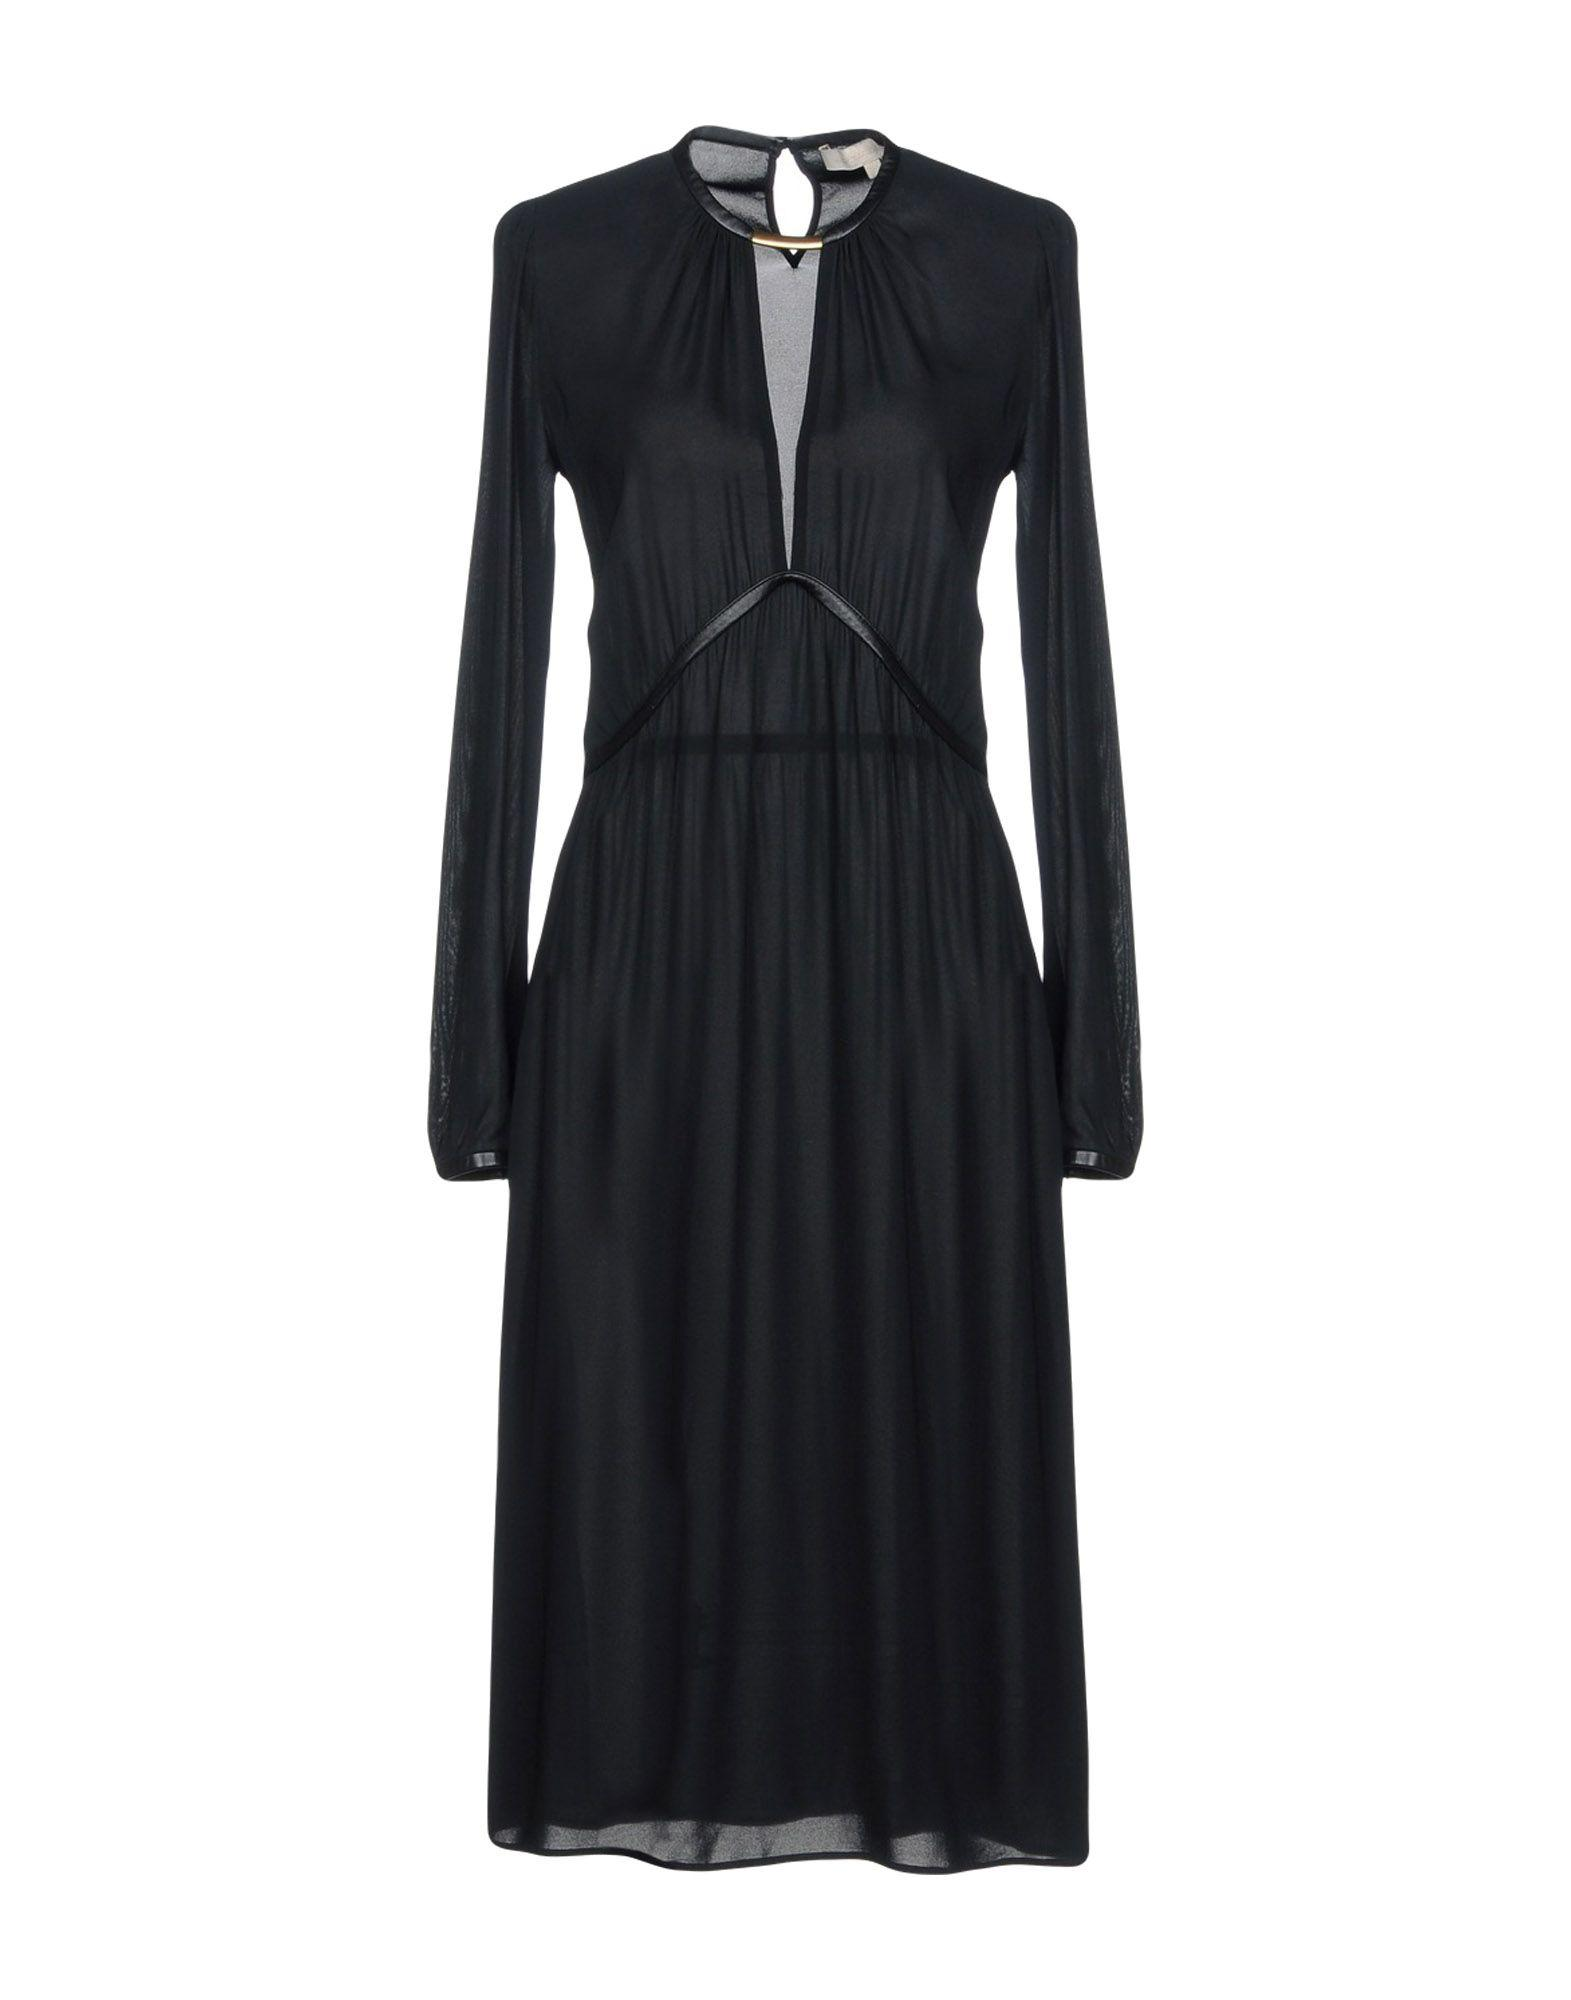 Vanessa Bruno 3/4 Length Dresses In Black